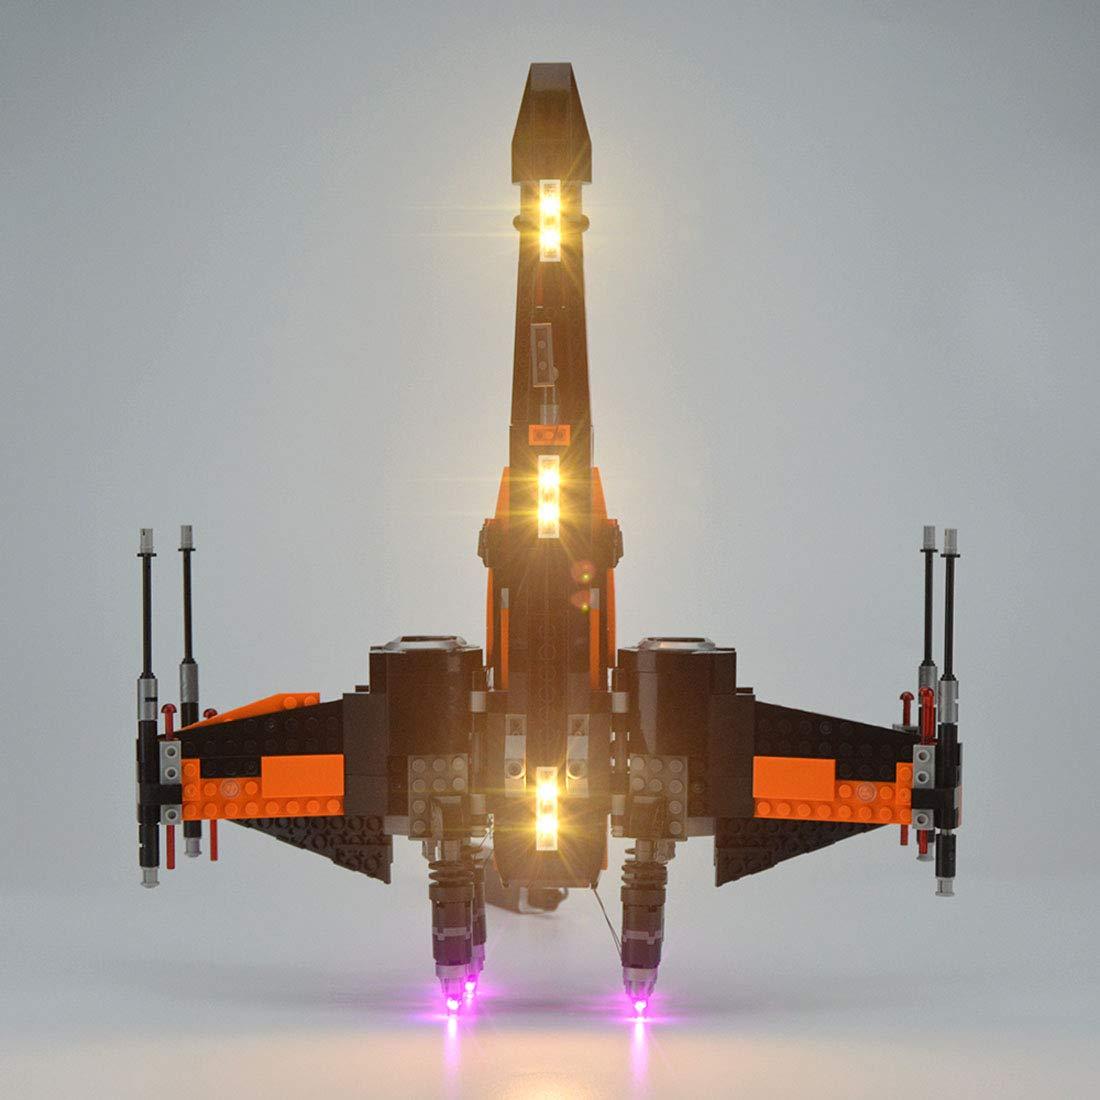 TLJ Poe's X-Wing Fighter Lighting Lego set 4